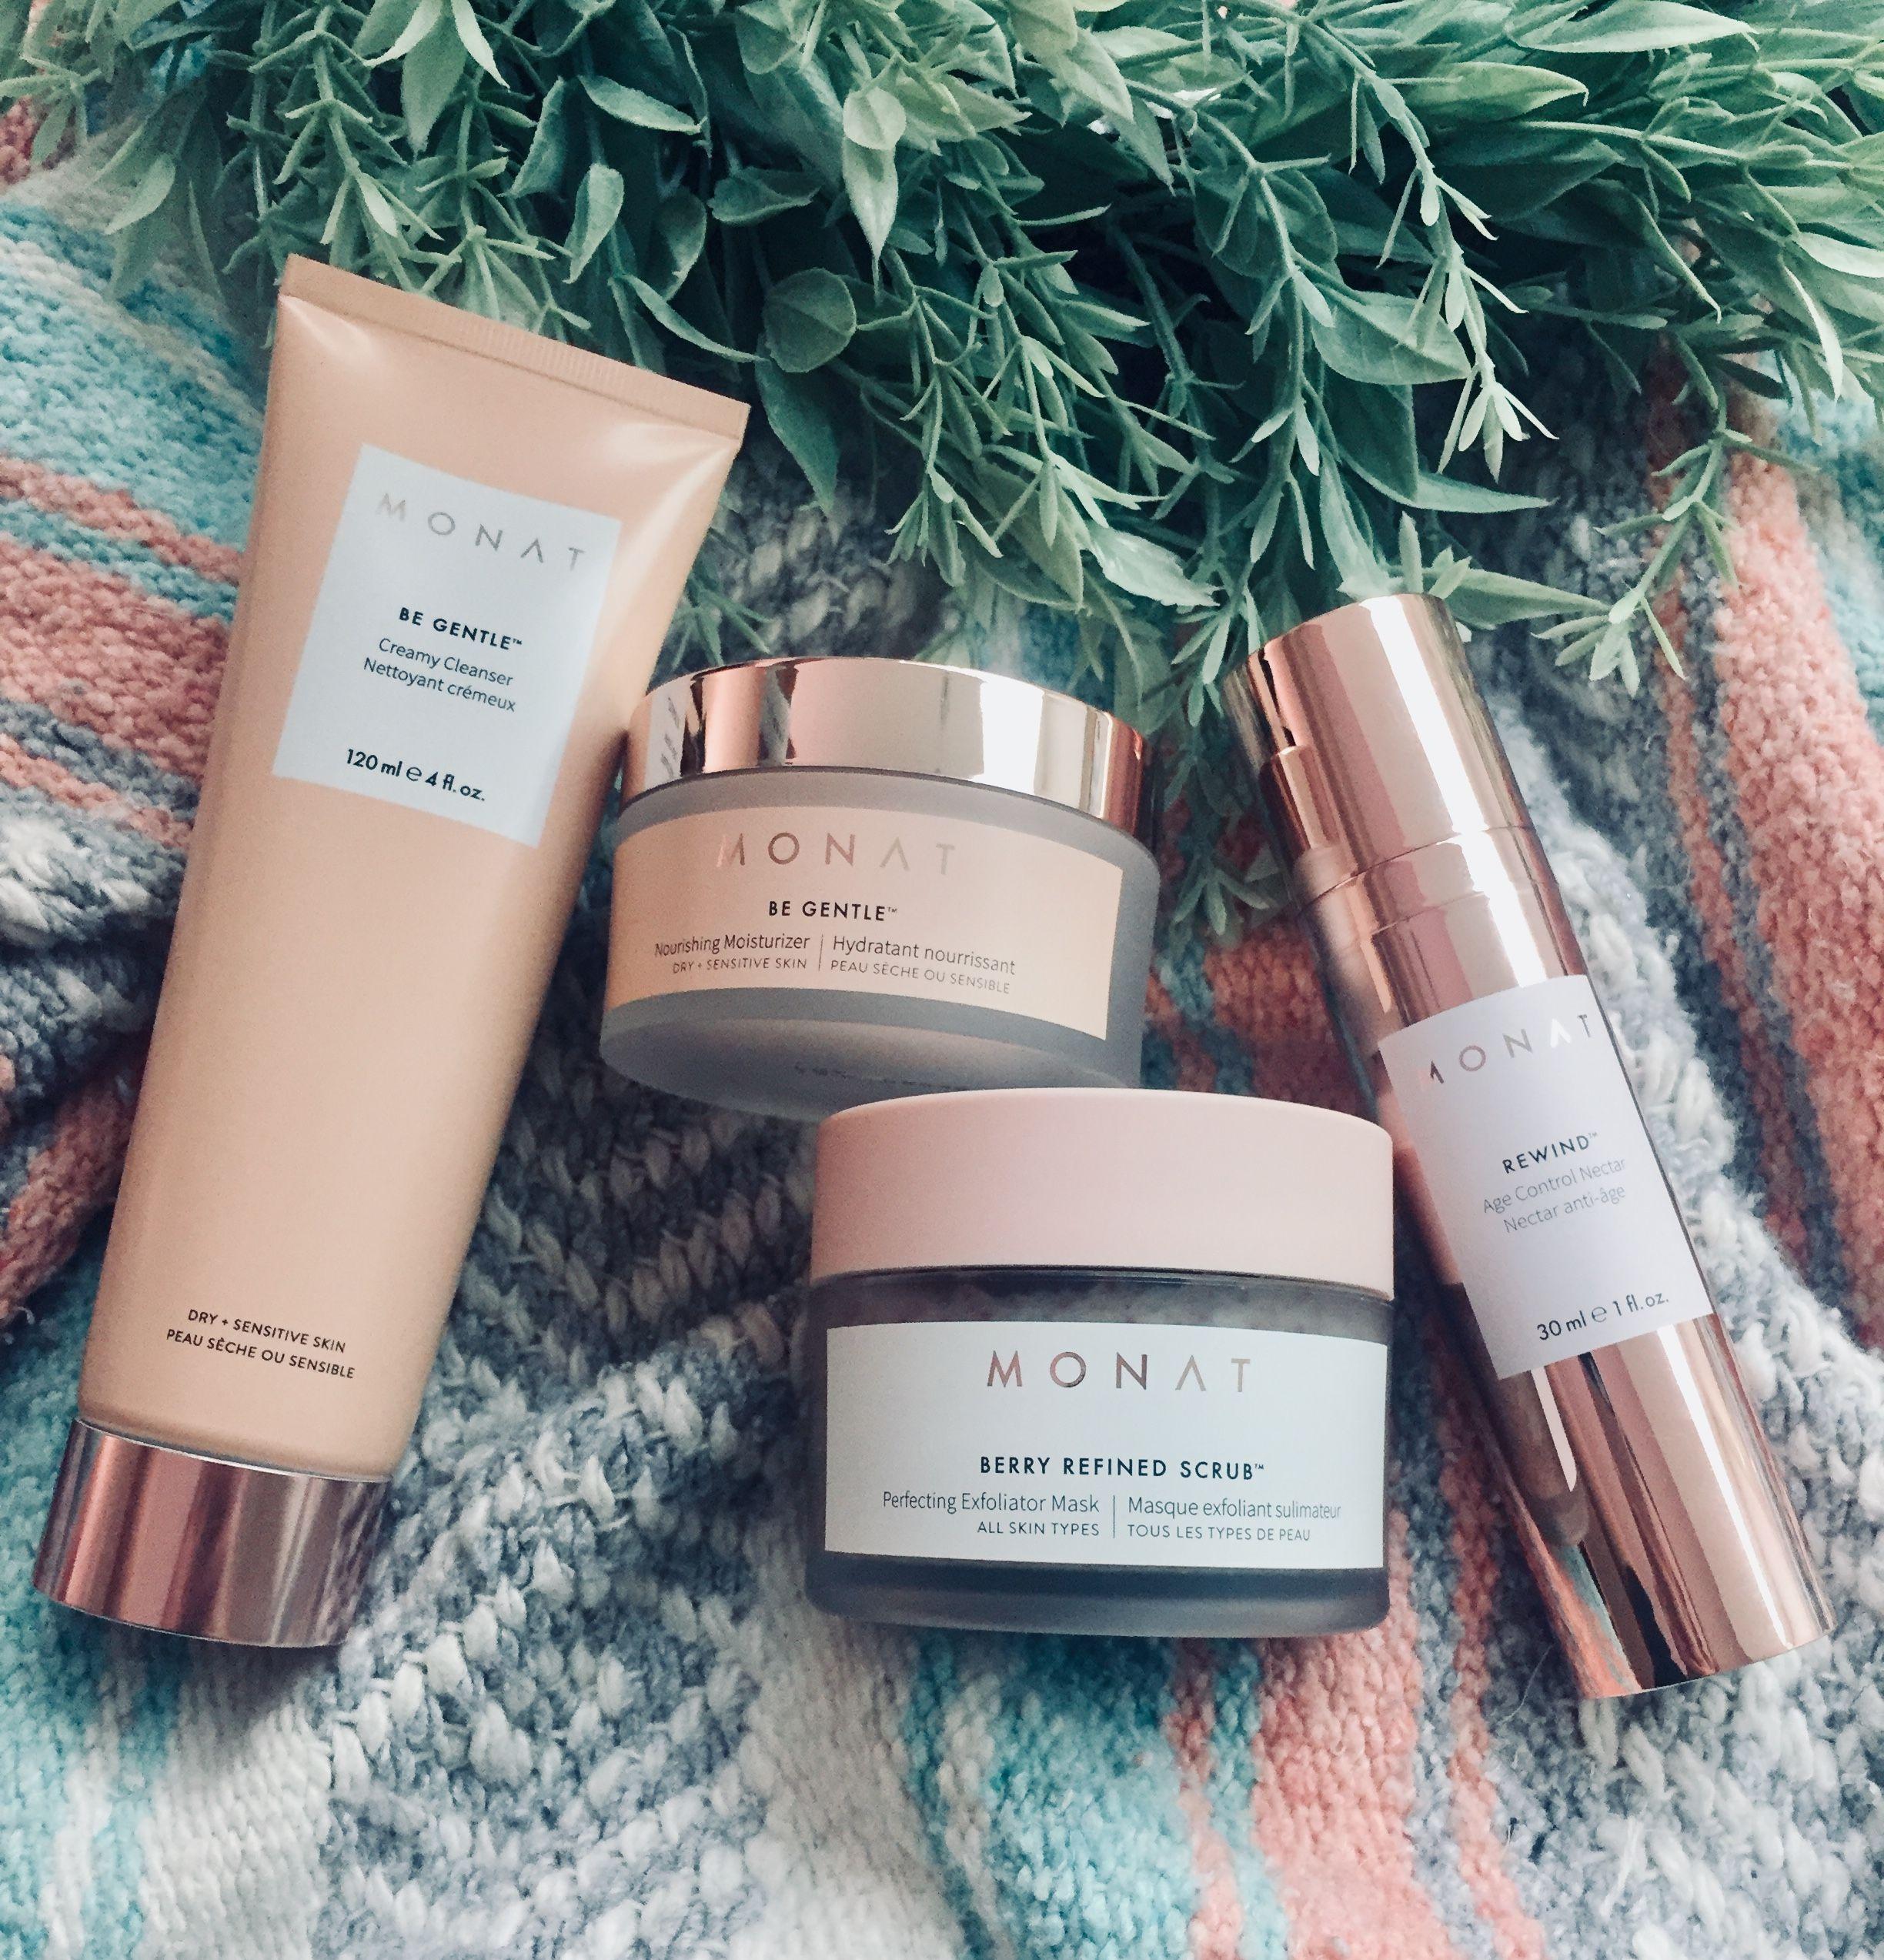 skincare skincareroutine monat in 2020 Monat, Skin